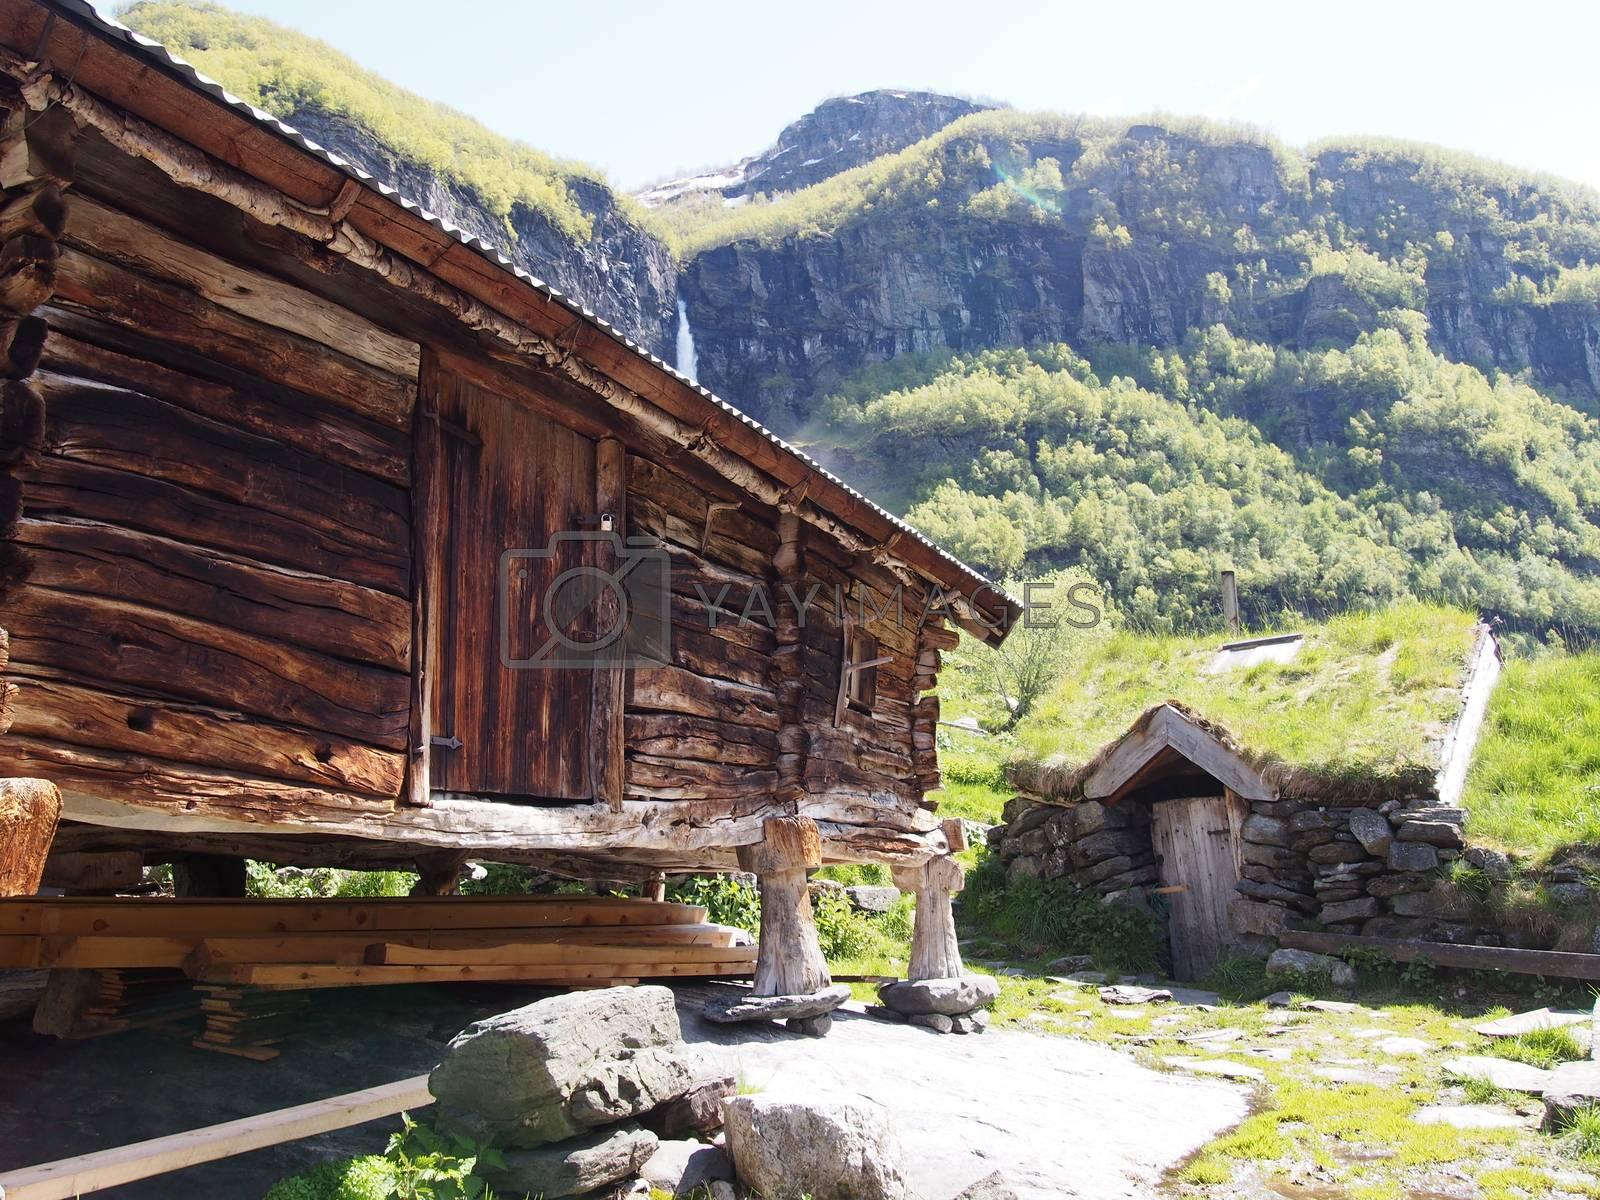 Sinjarbu farm, Aurlandsdalen, Norway